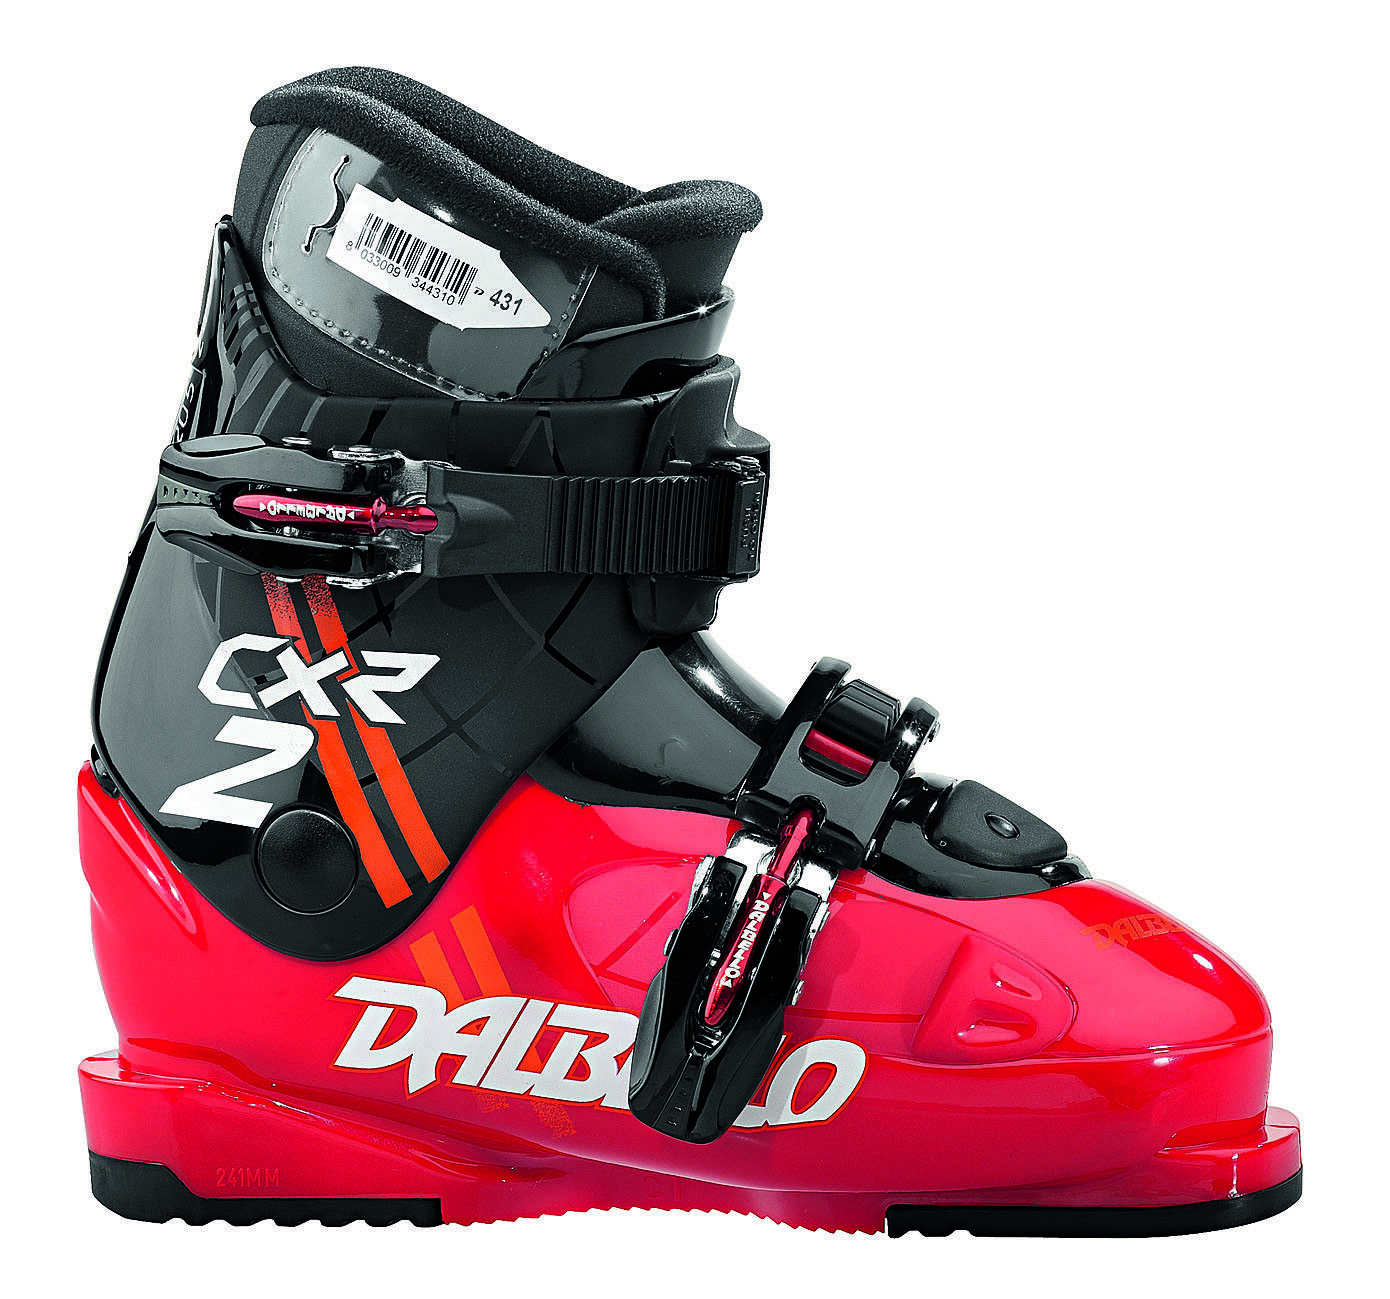 Dalbello RTL-CXR 2 Jr - Kinder Skischuh Ski Stiefel - DRC2J6.RA black red